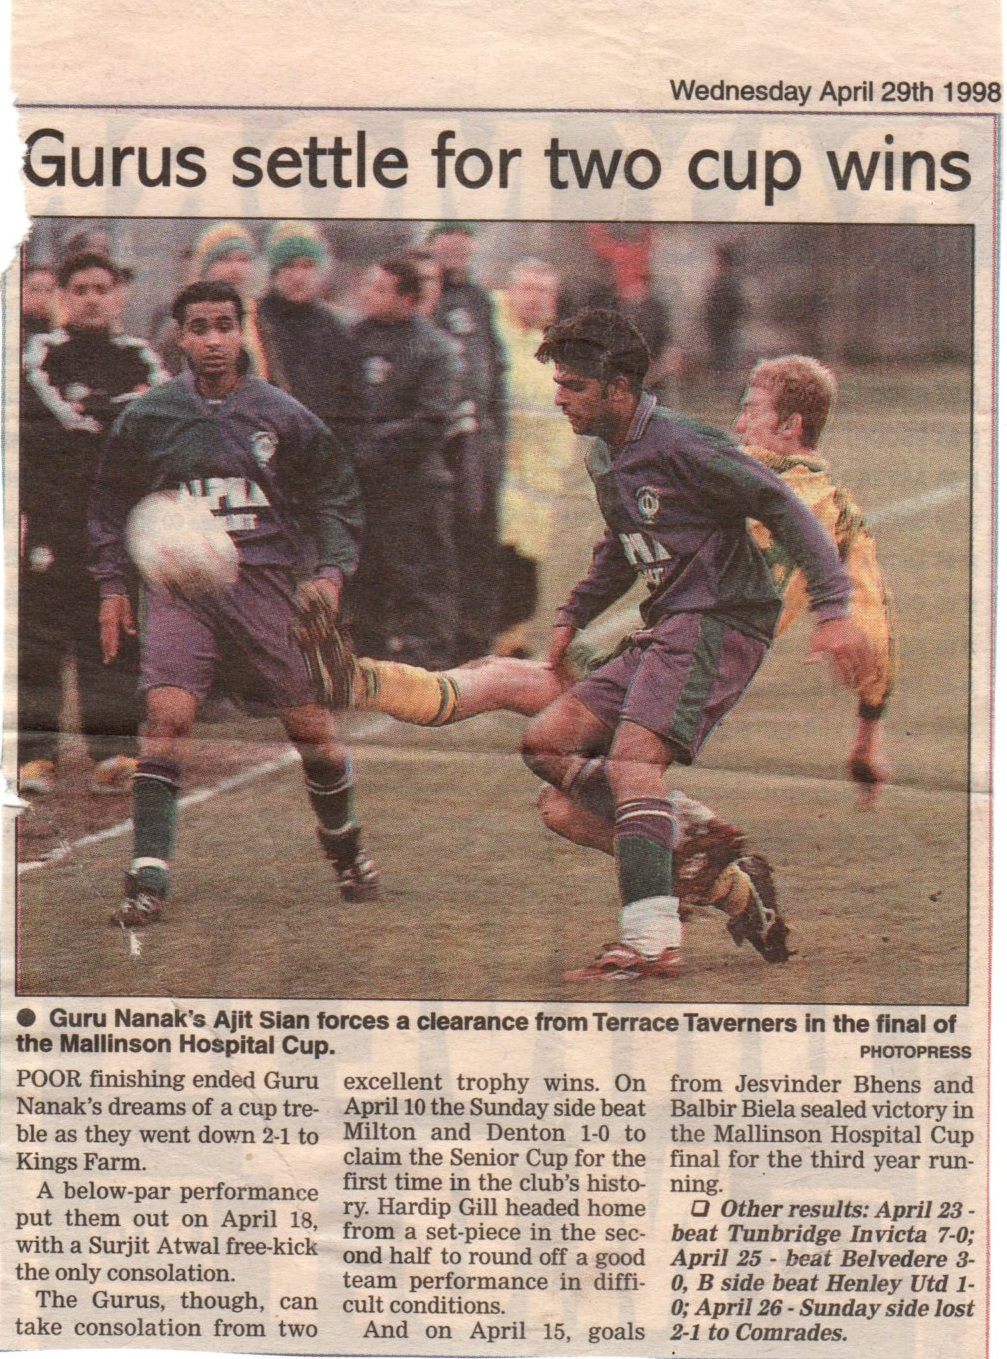 Malinson Hospital Cup 1998